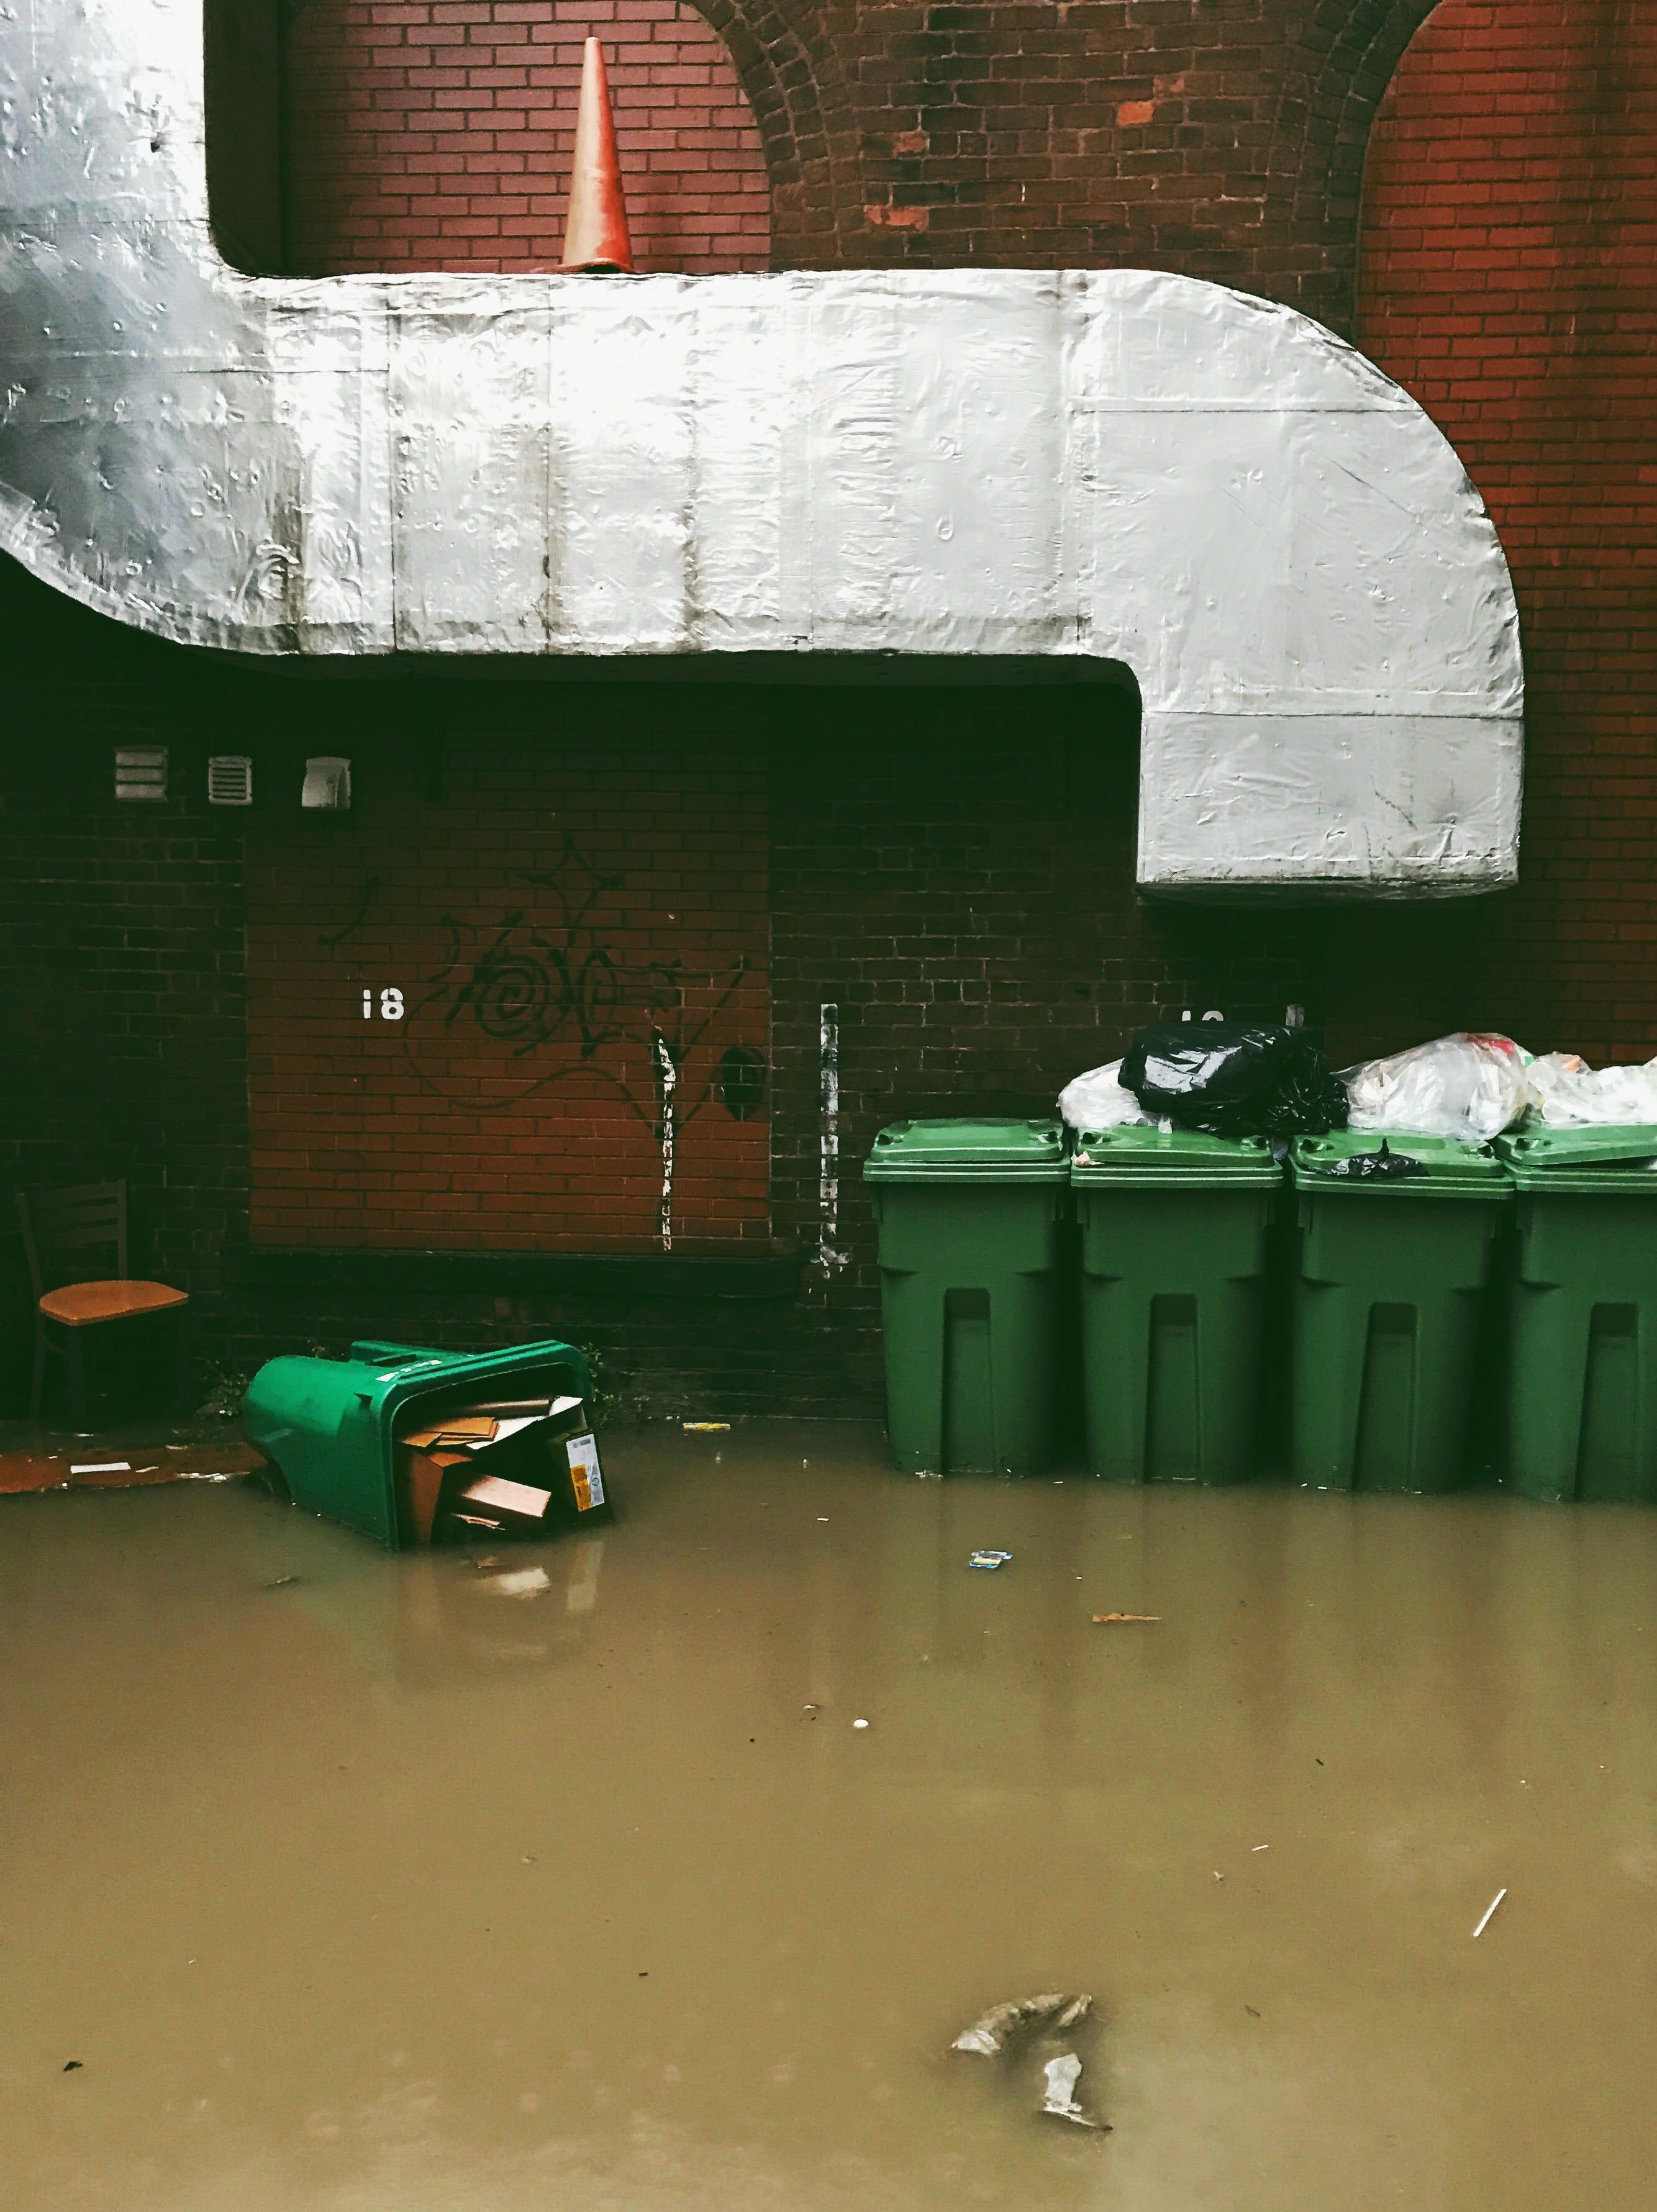 A photograph depicting Flooded Alleyway Saint John